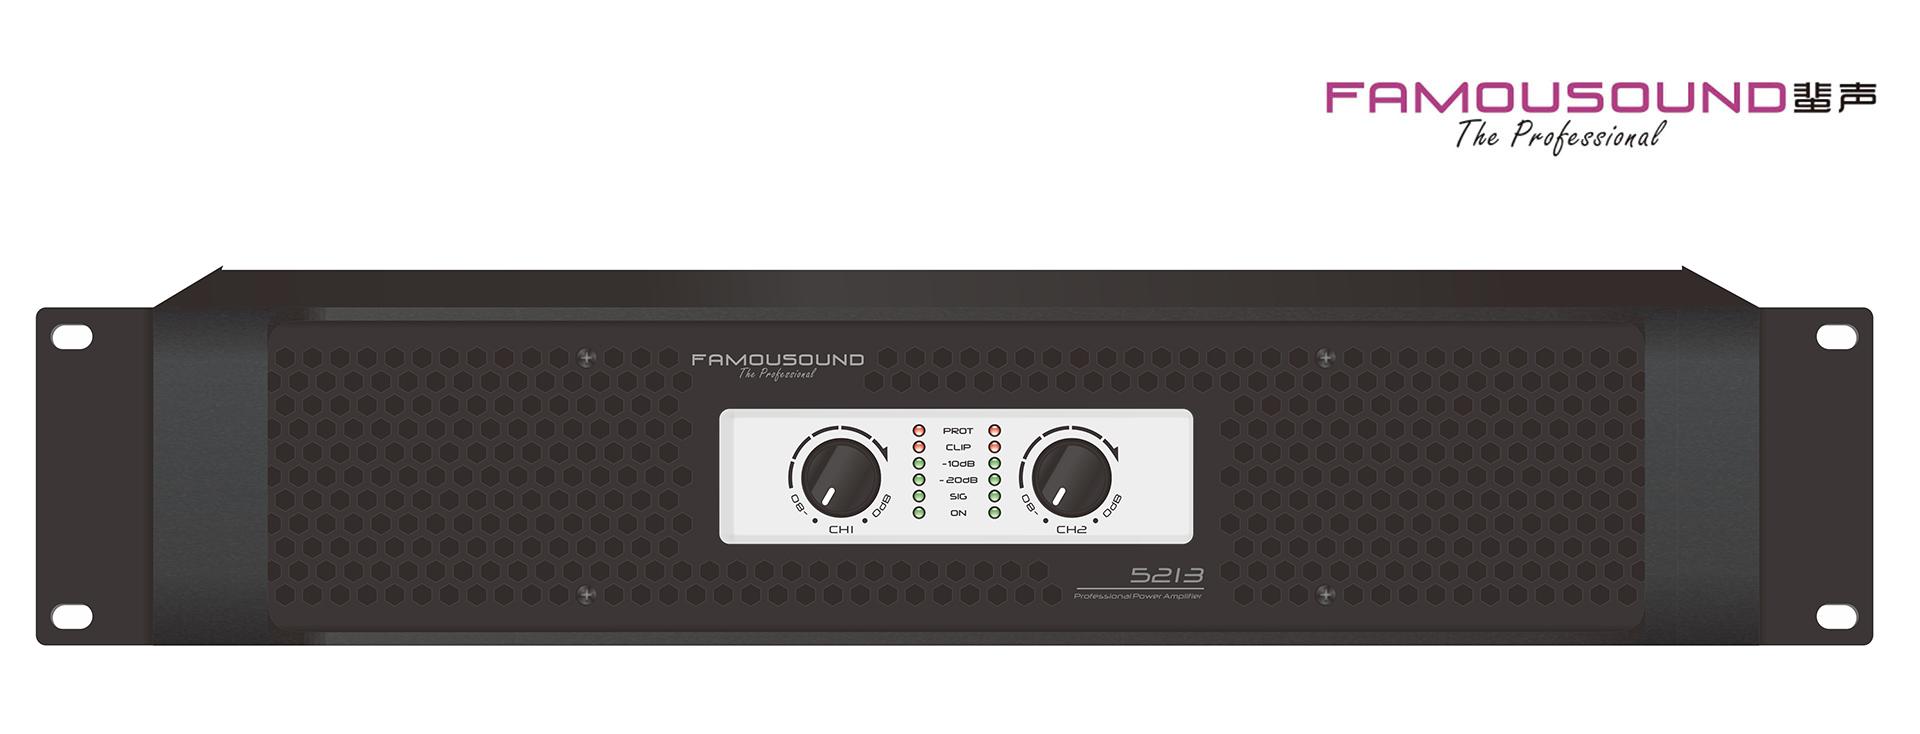 SOUNDSTANDARD 5000 series user's manual